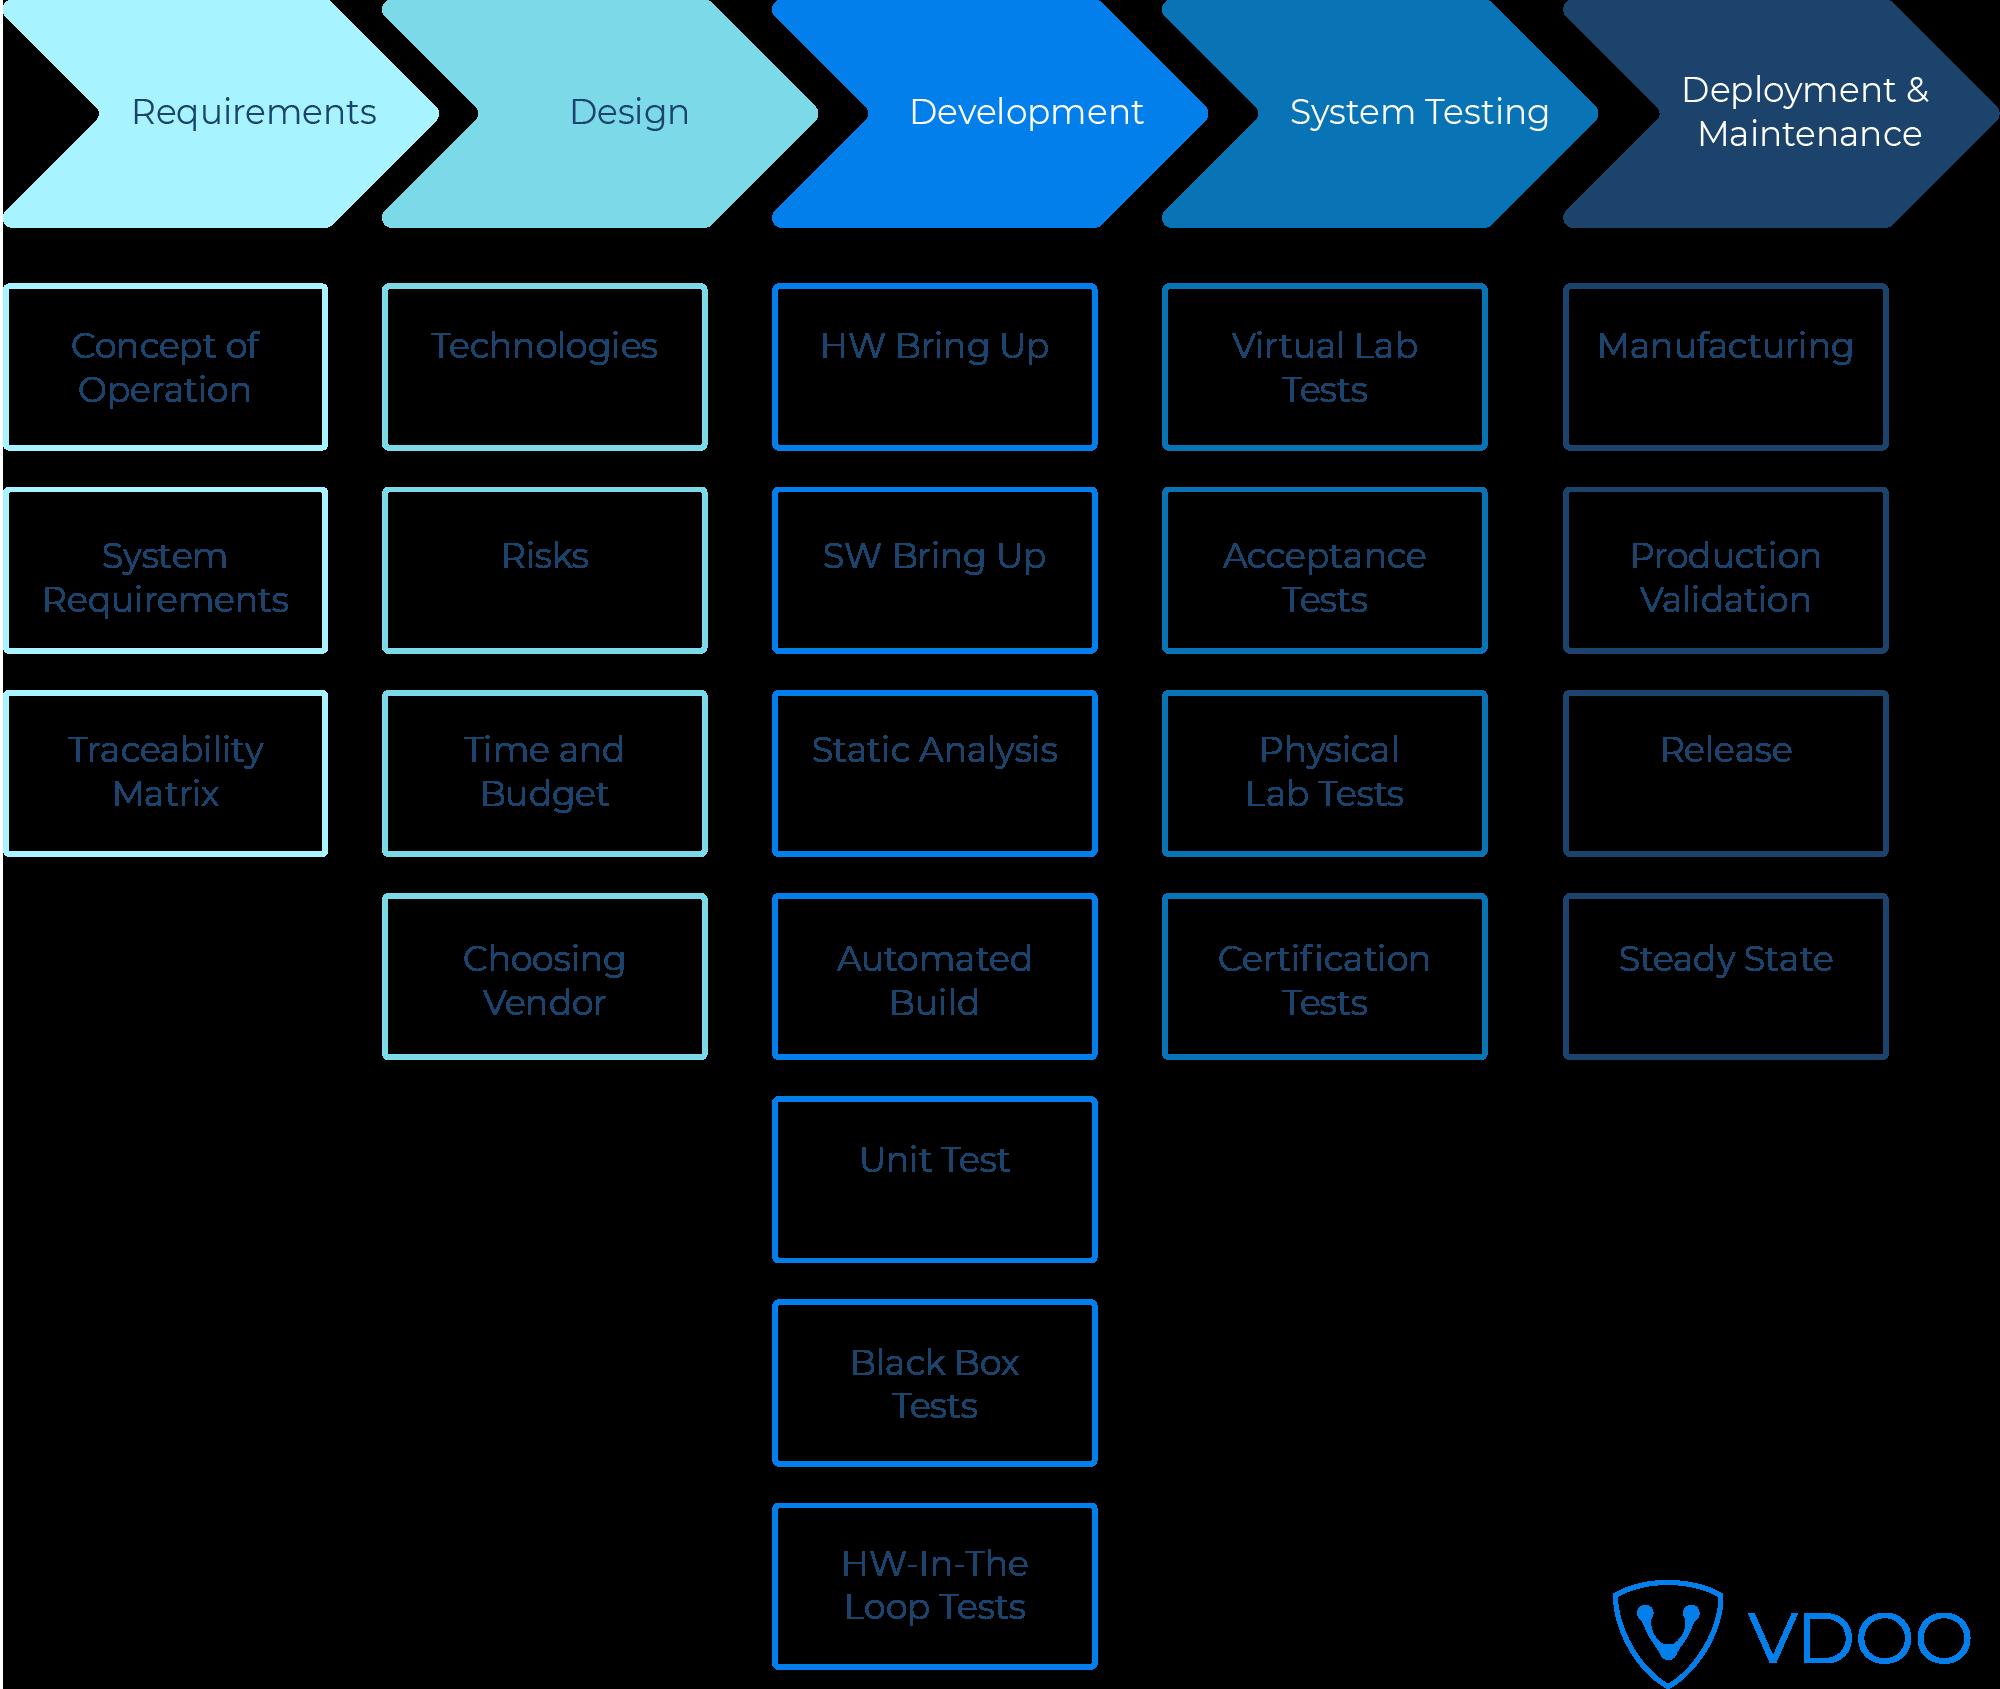 SDLC process detailed